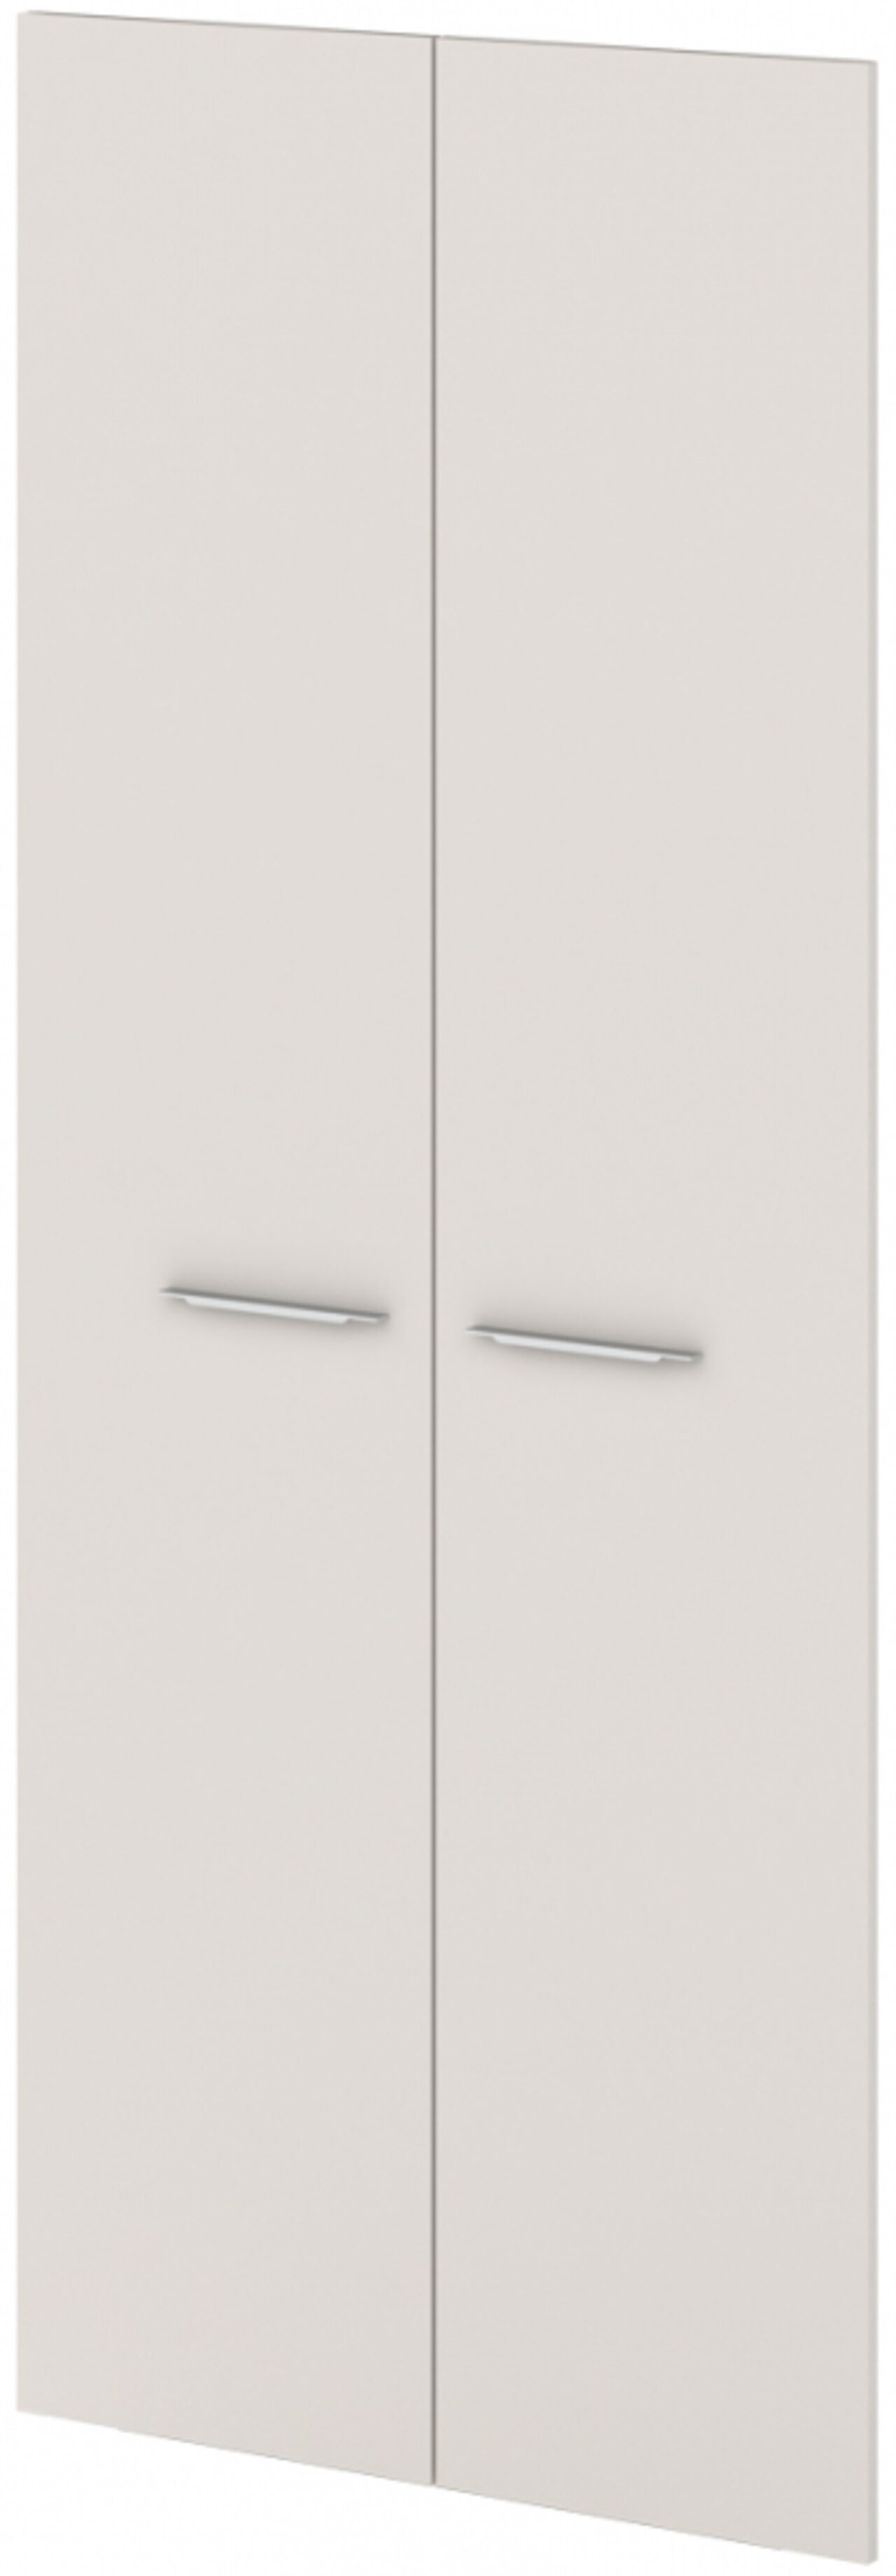 Двери ЛДСП высокие  Grandeza 2x90x221 - фото 6